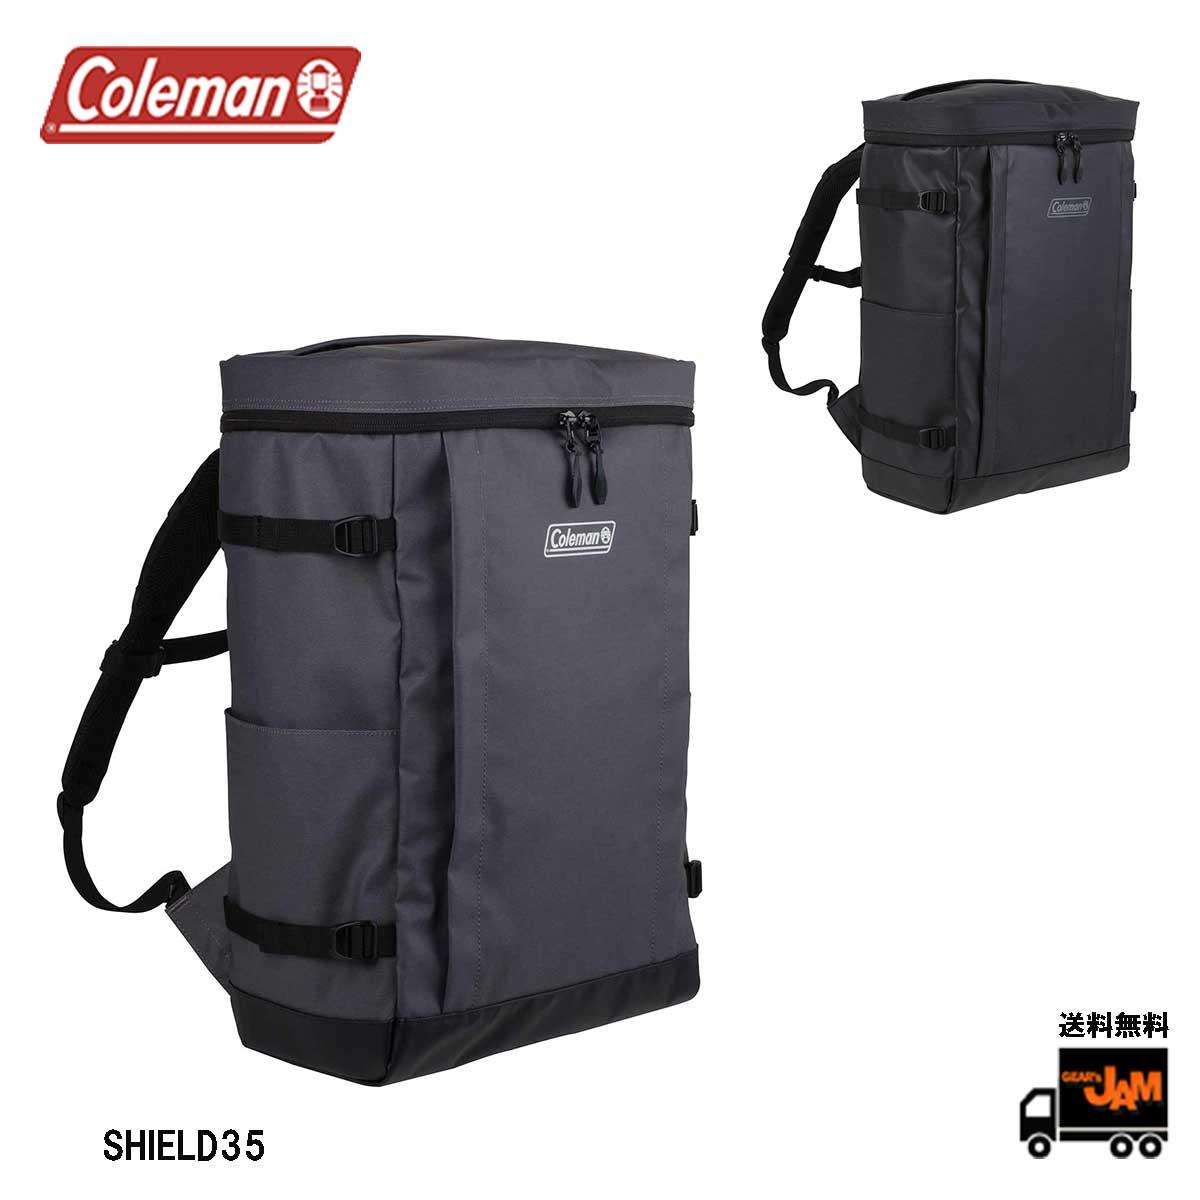 Coleman コールマン SHIELD35 シールド35 豊富な品 アウトドア リュックサック 新商品 リュック デイパック 耐水 レディース メンズ 35L A3 送料無料 撥水